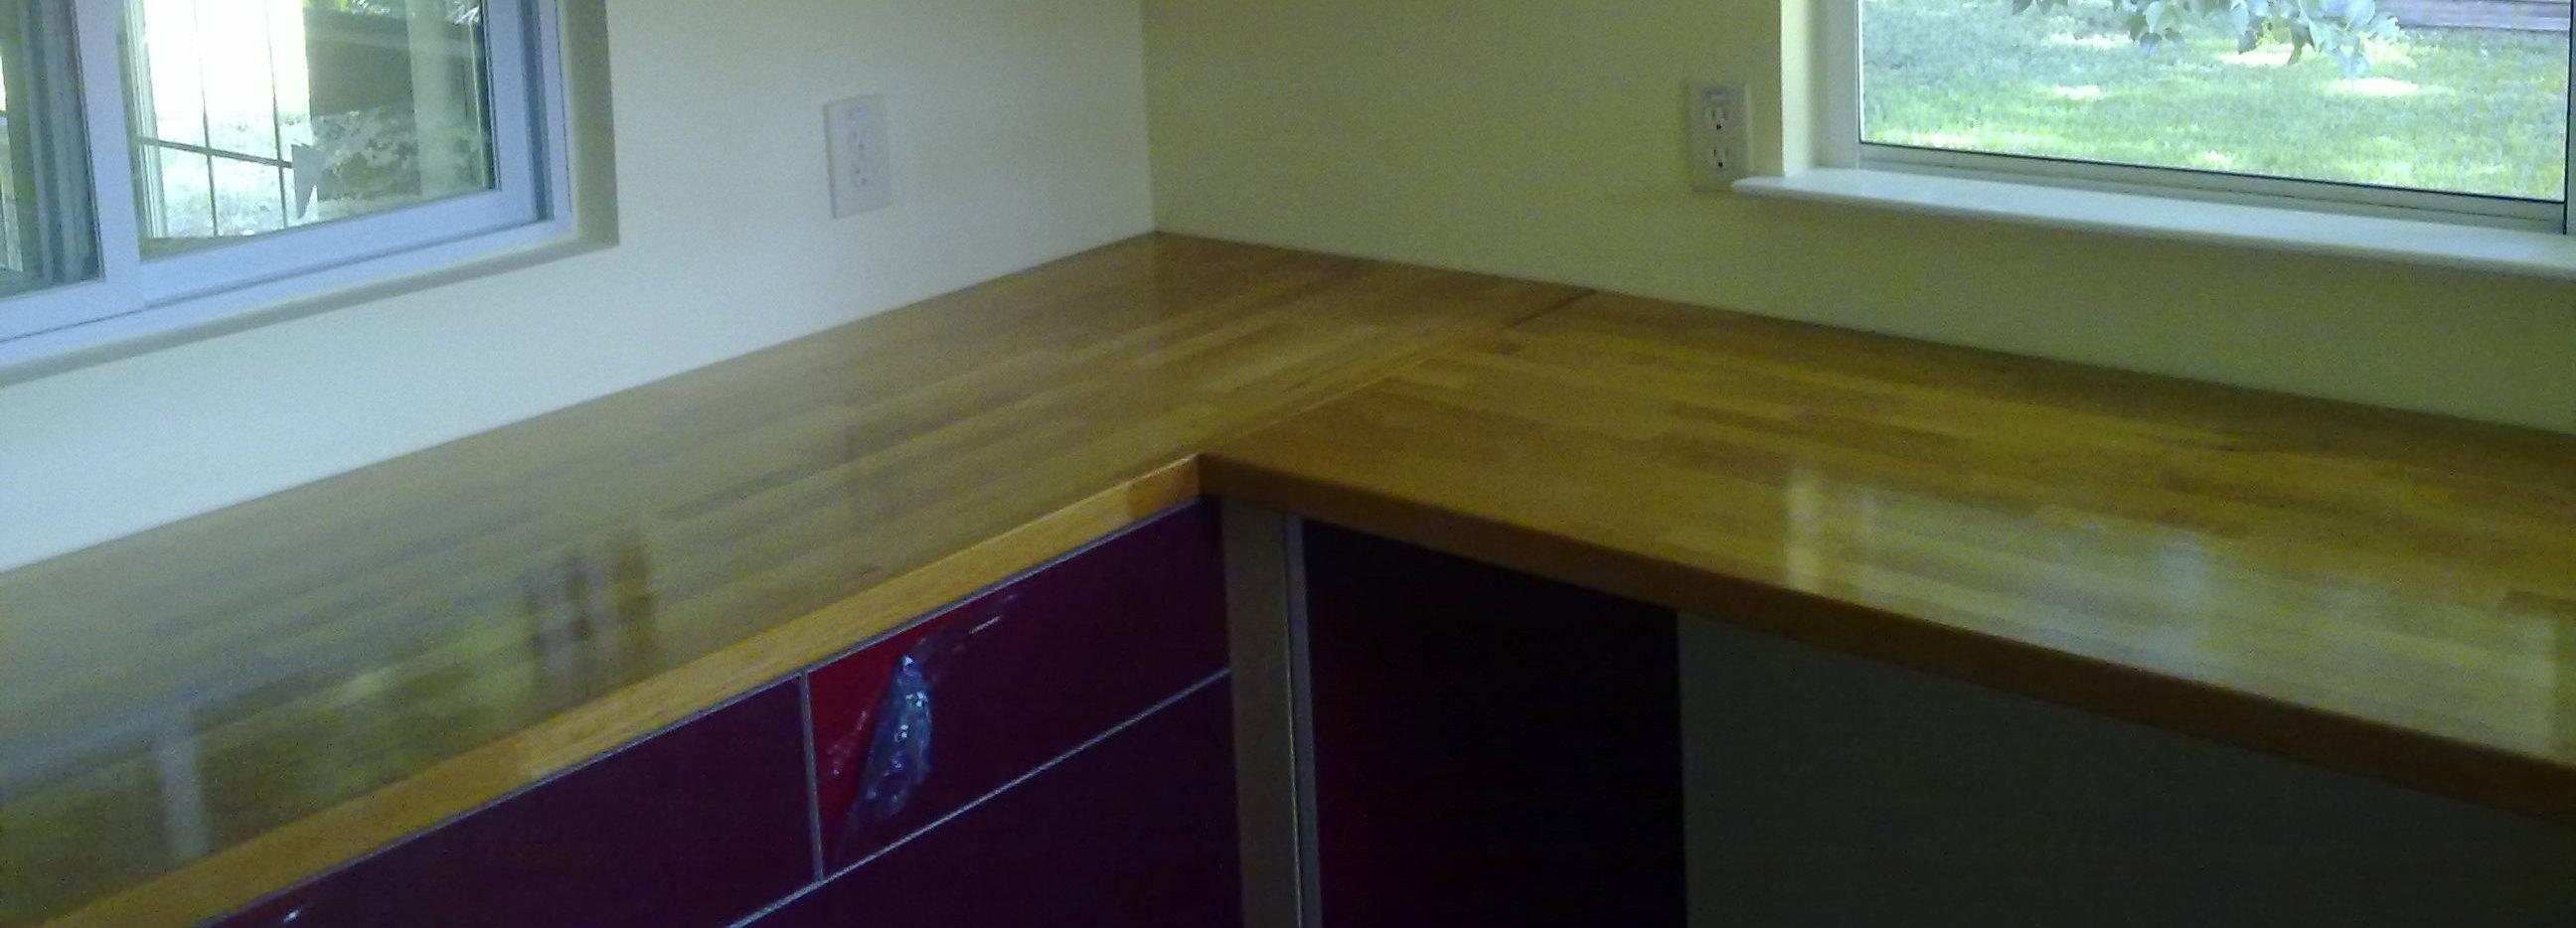 countertops sale country under kitchen cabinet block coffee com for corner lighting remodel simplymaggie butcher renovation